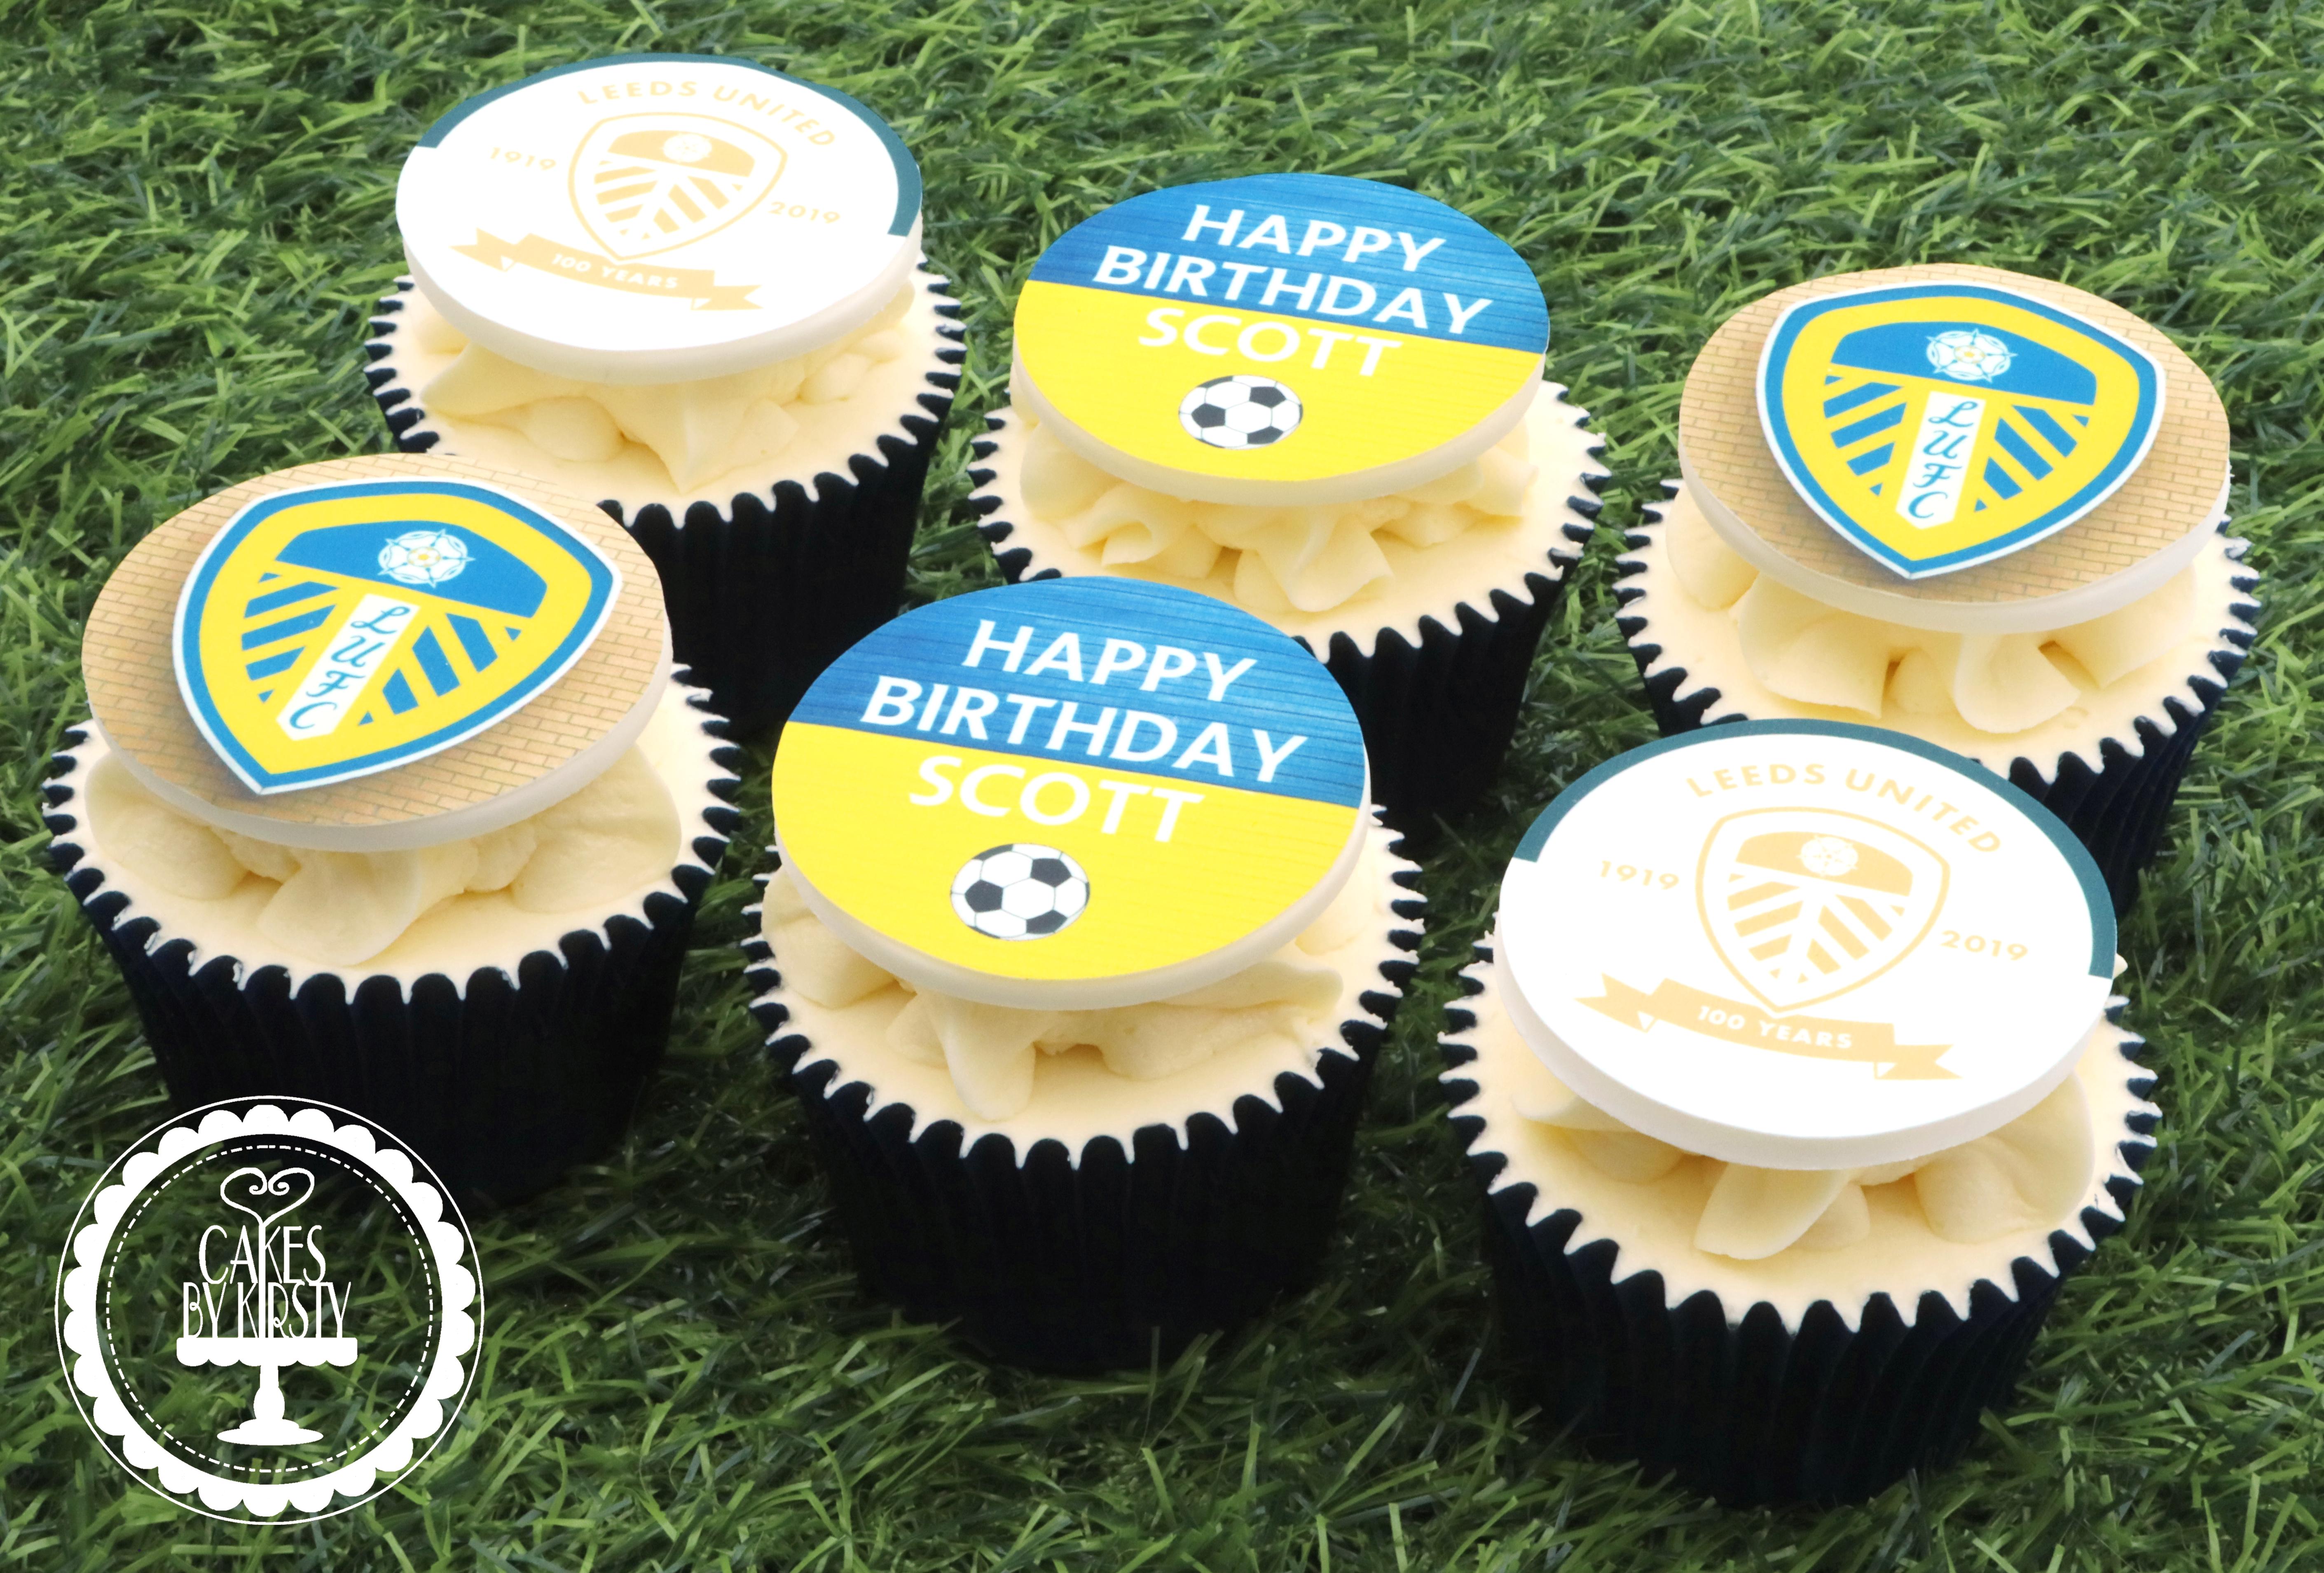 20190915 - Leeds United Cupcakes